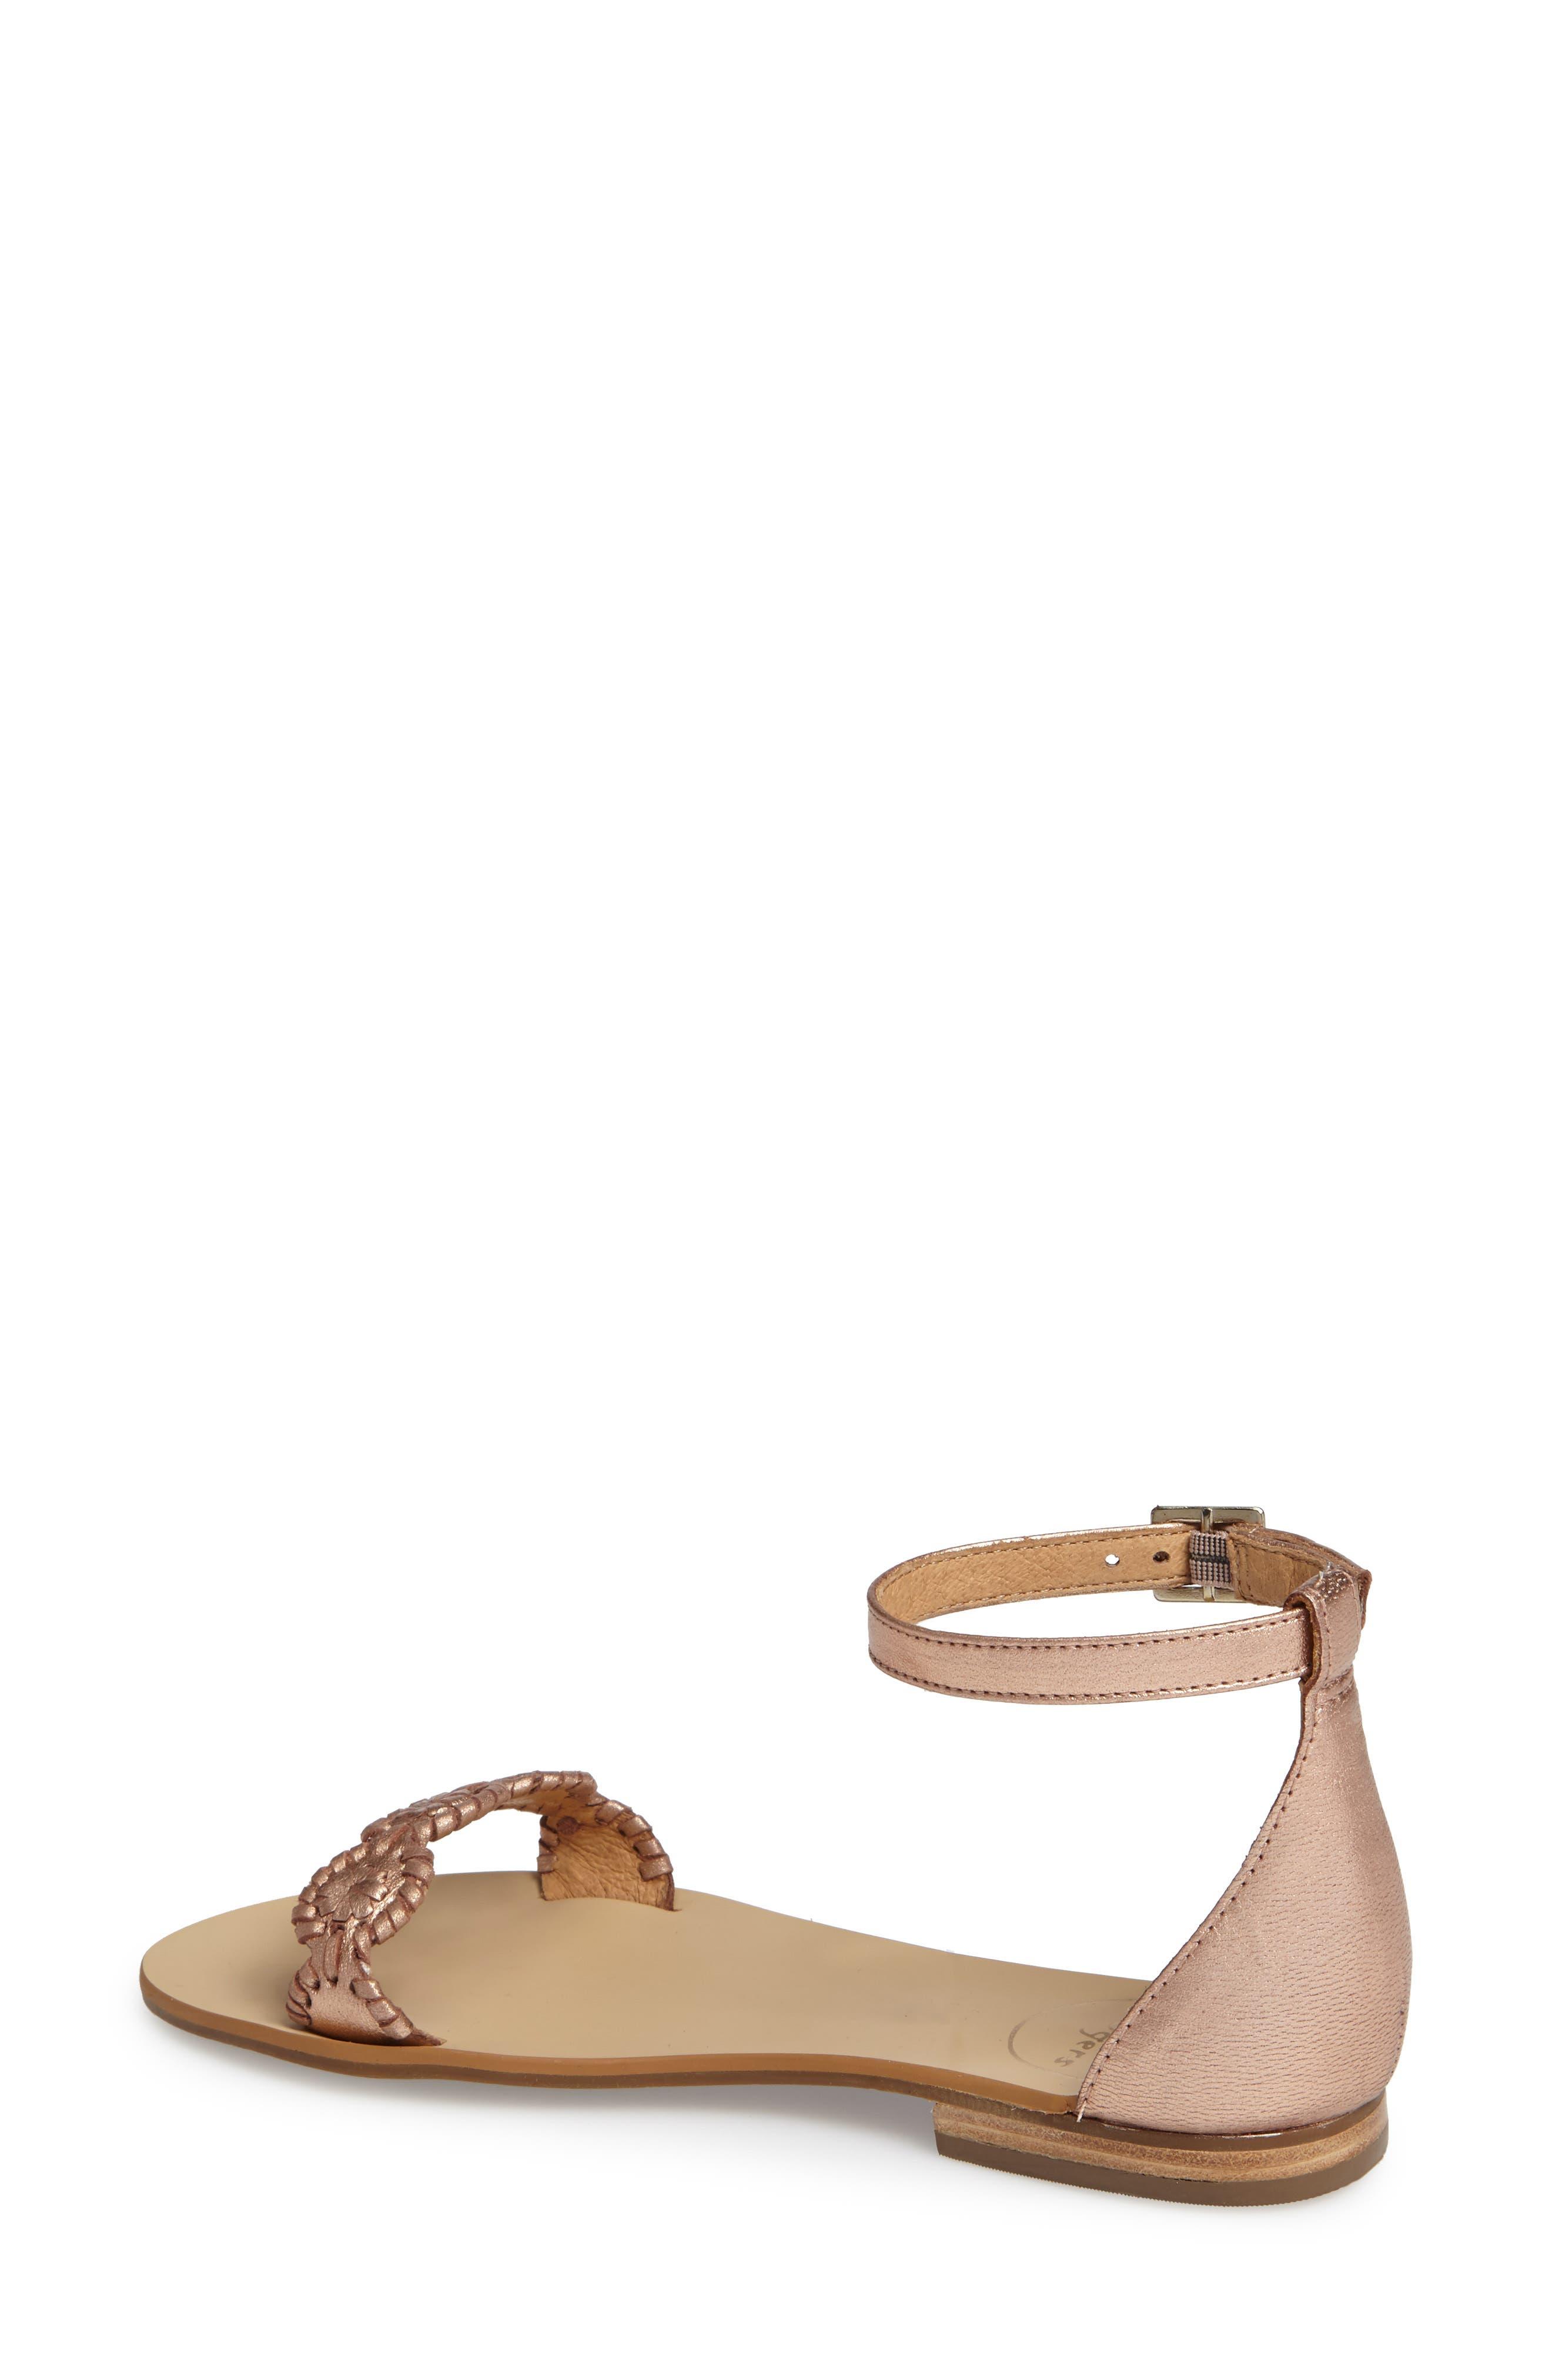 Daphne Medallion Flat Sandal,                             Alternate thumbnail 8, color,